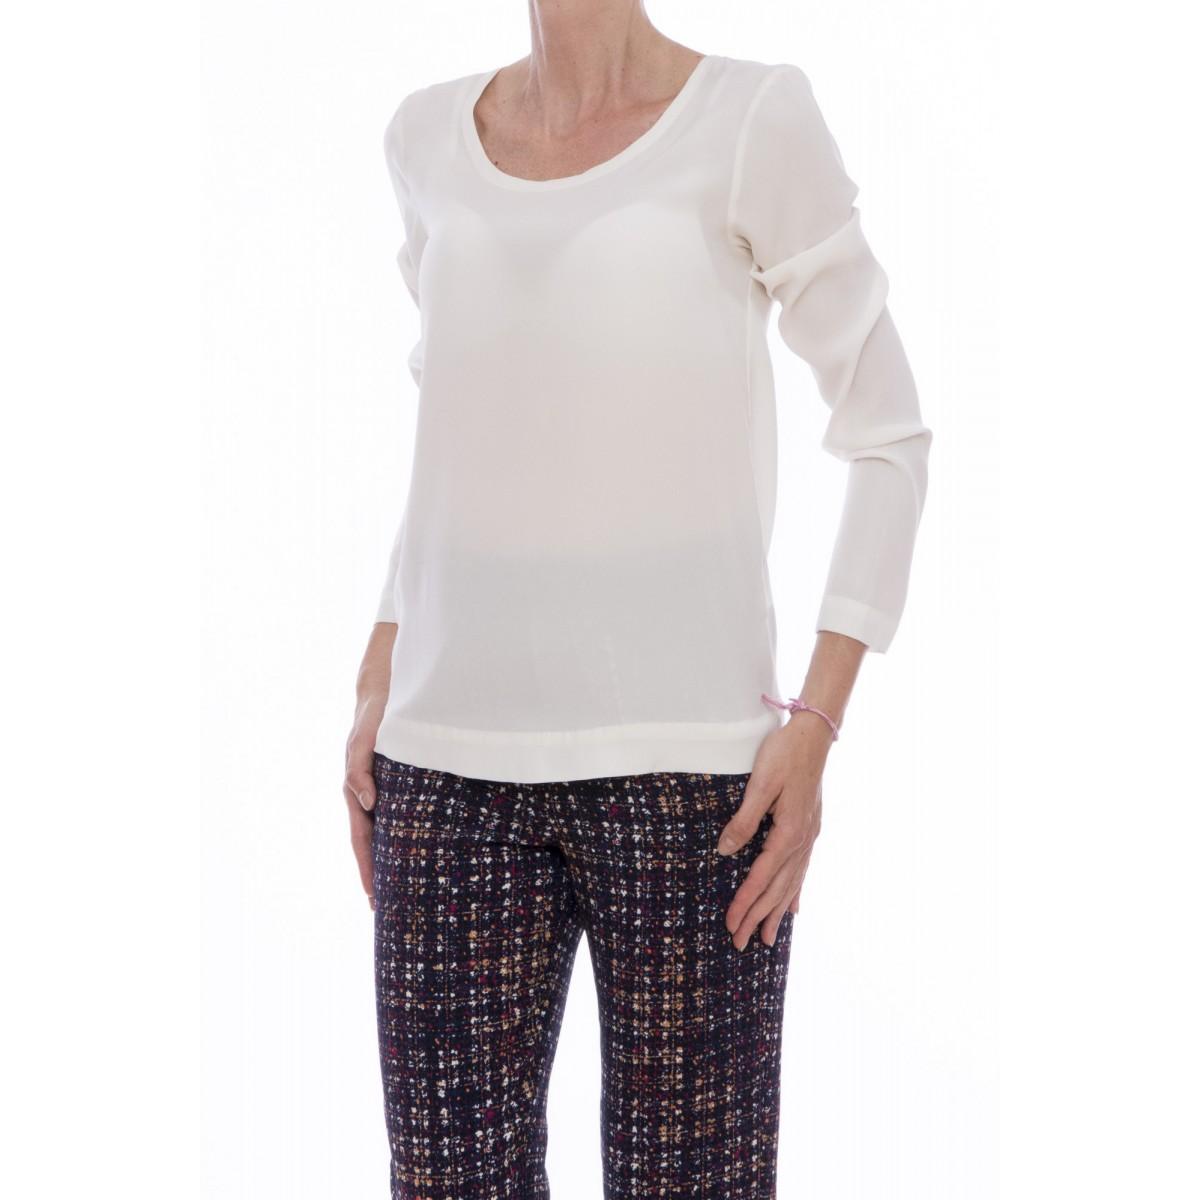 T-shirt Jucca - J2108o t-shirt seta manica lunga